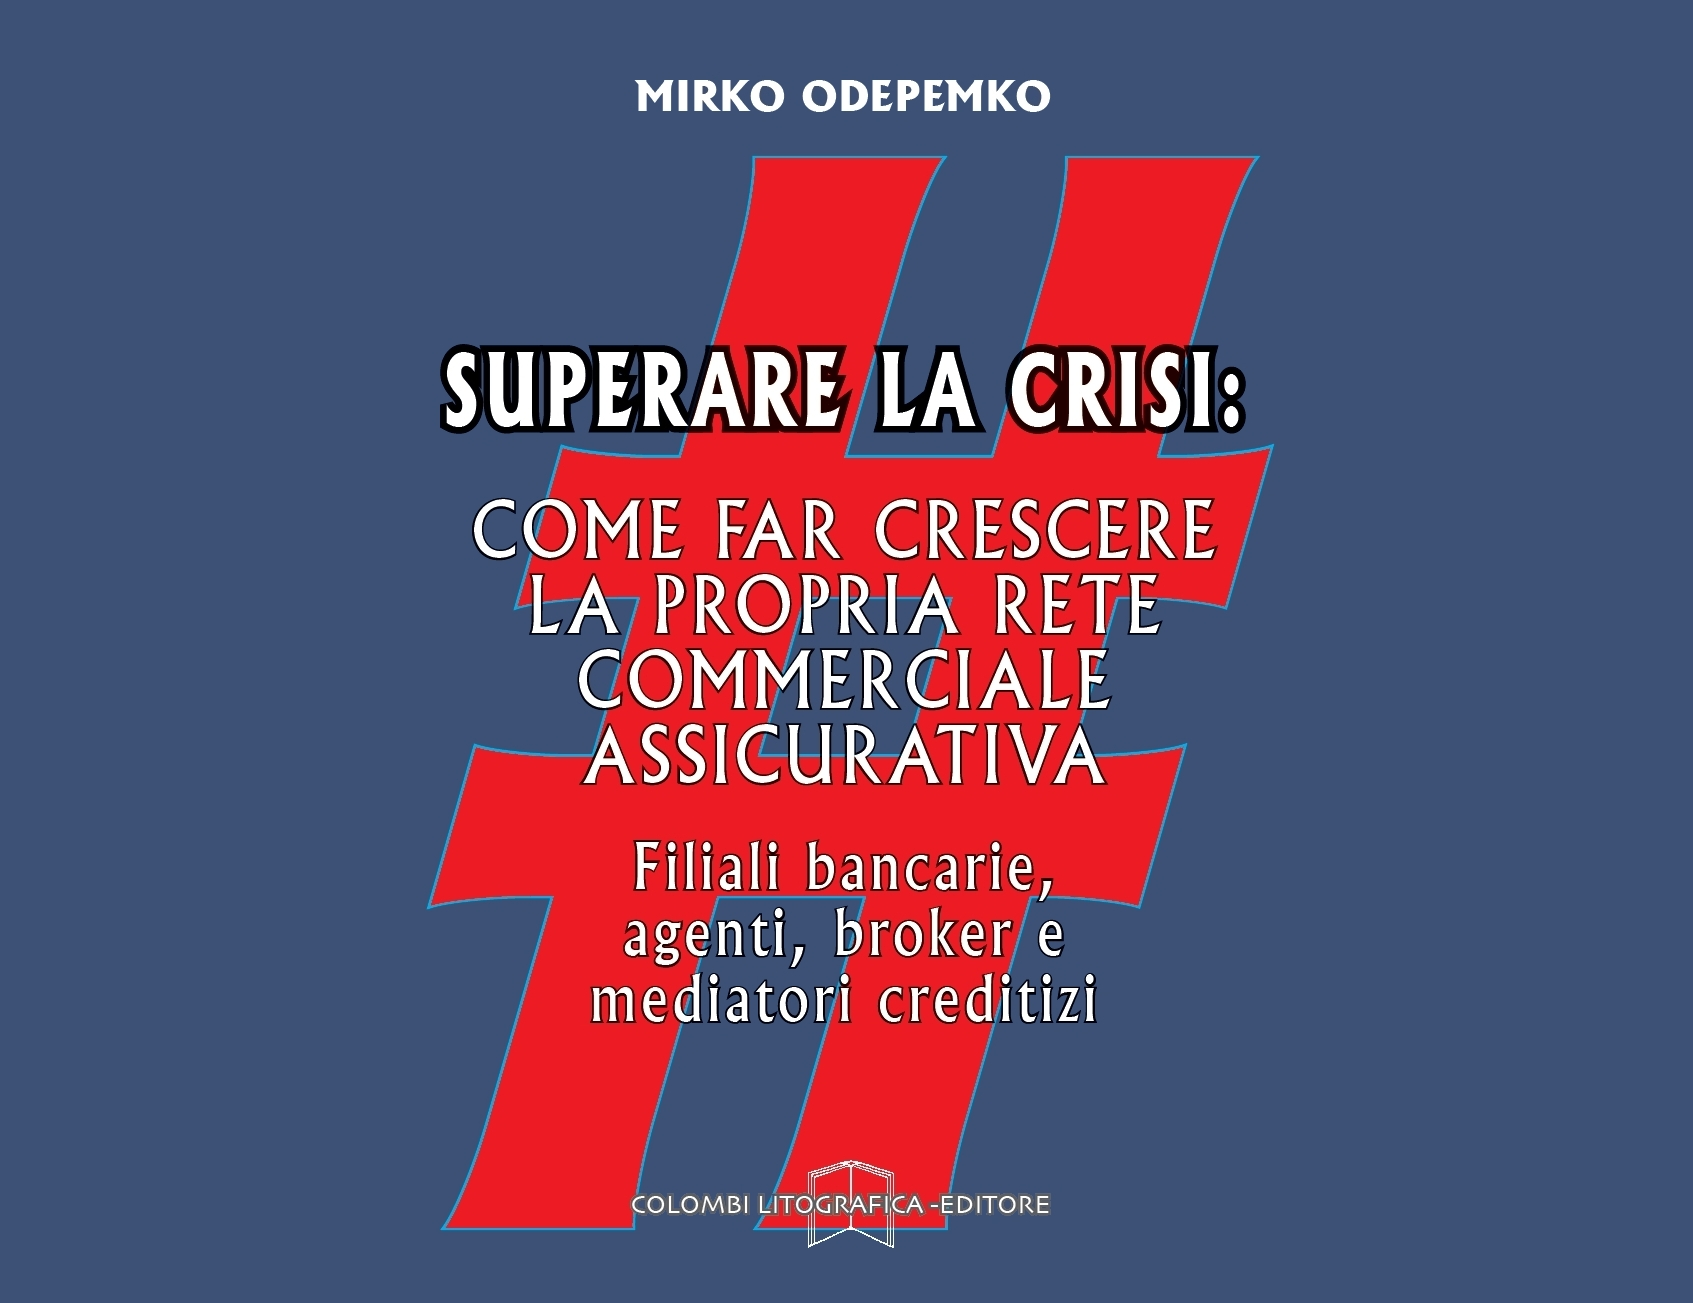 Mirko Odepemko - Superare la Crisi (2) Imc